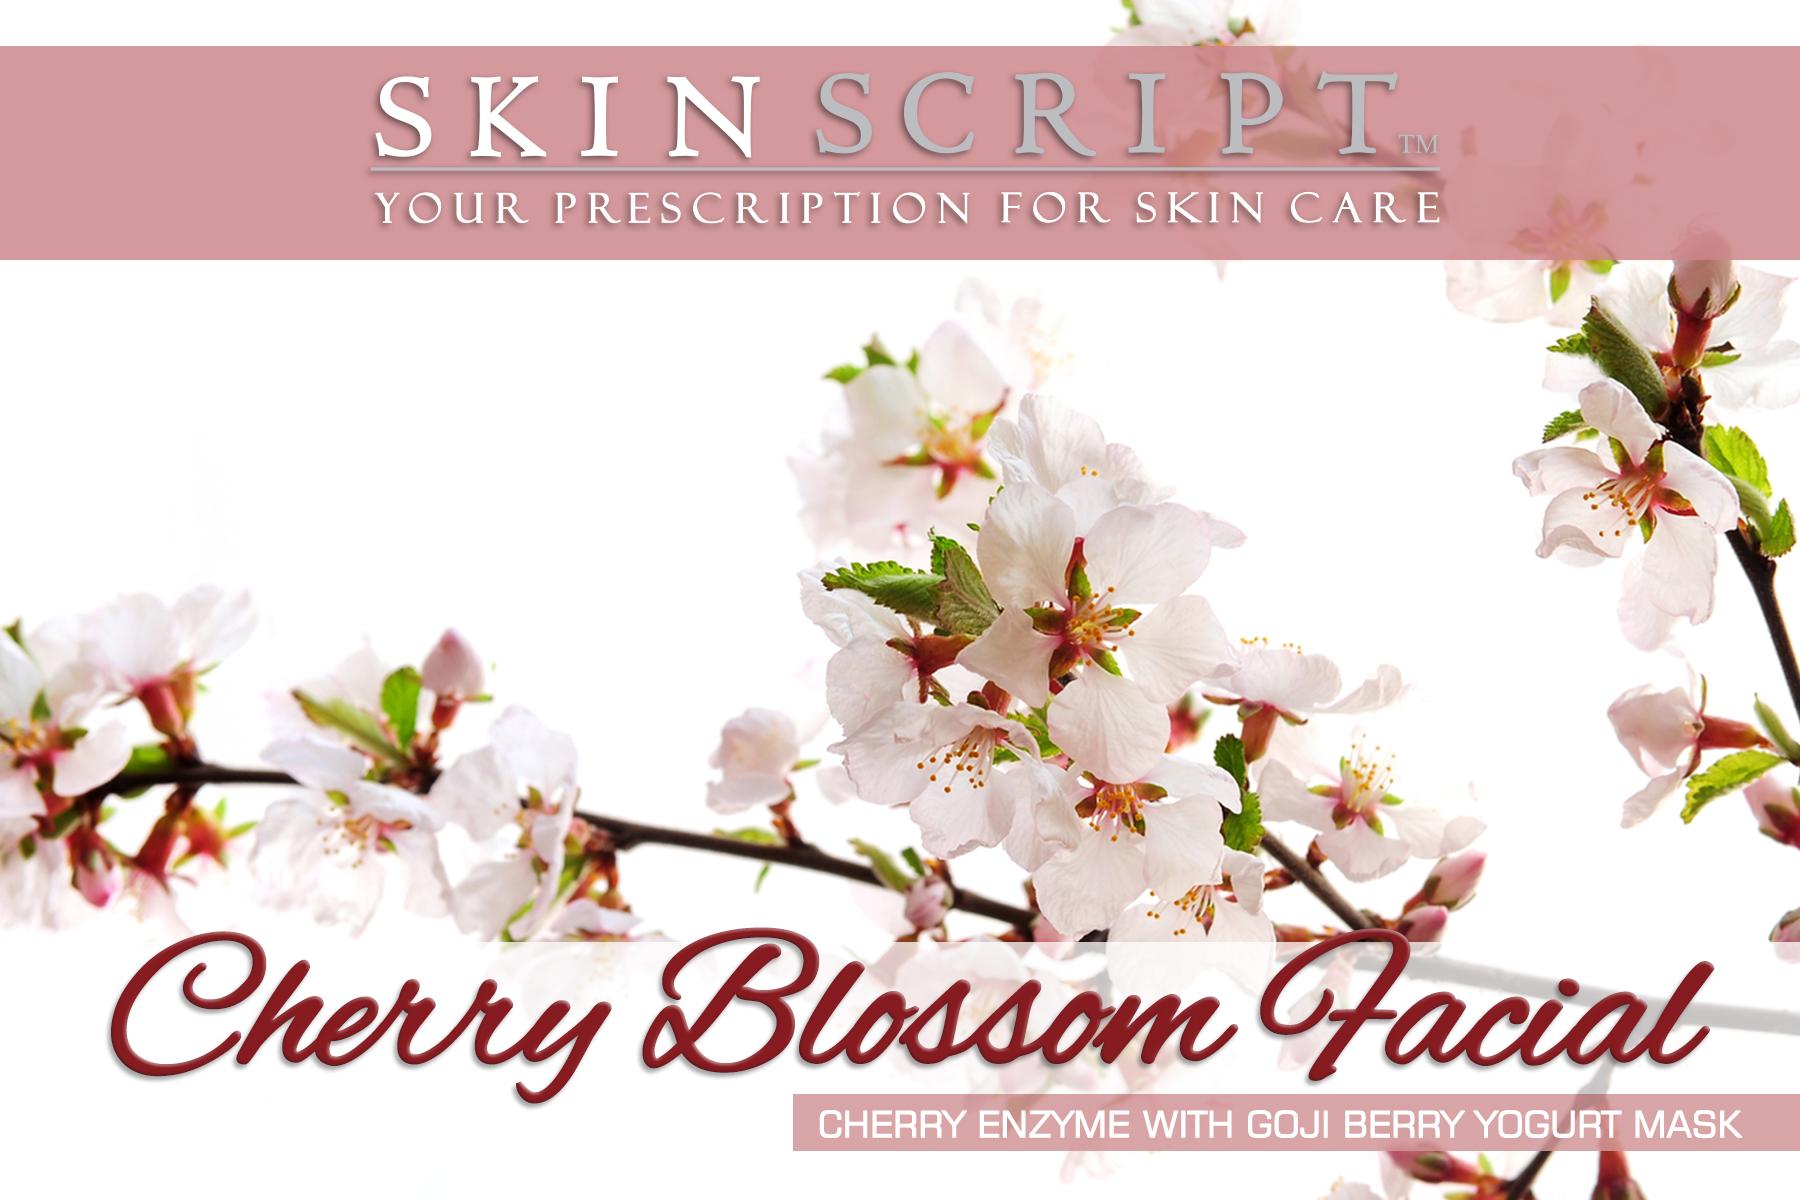 CherryBlossomFacial_4x6_1_HR.jpg